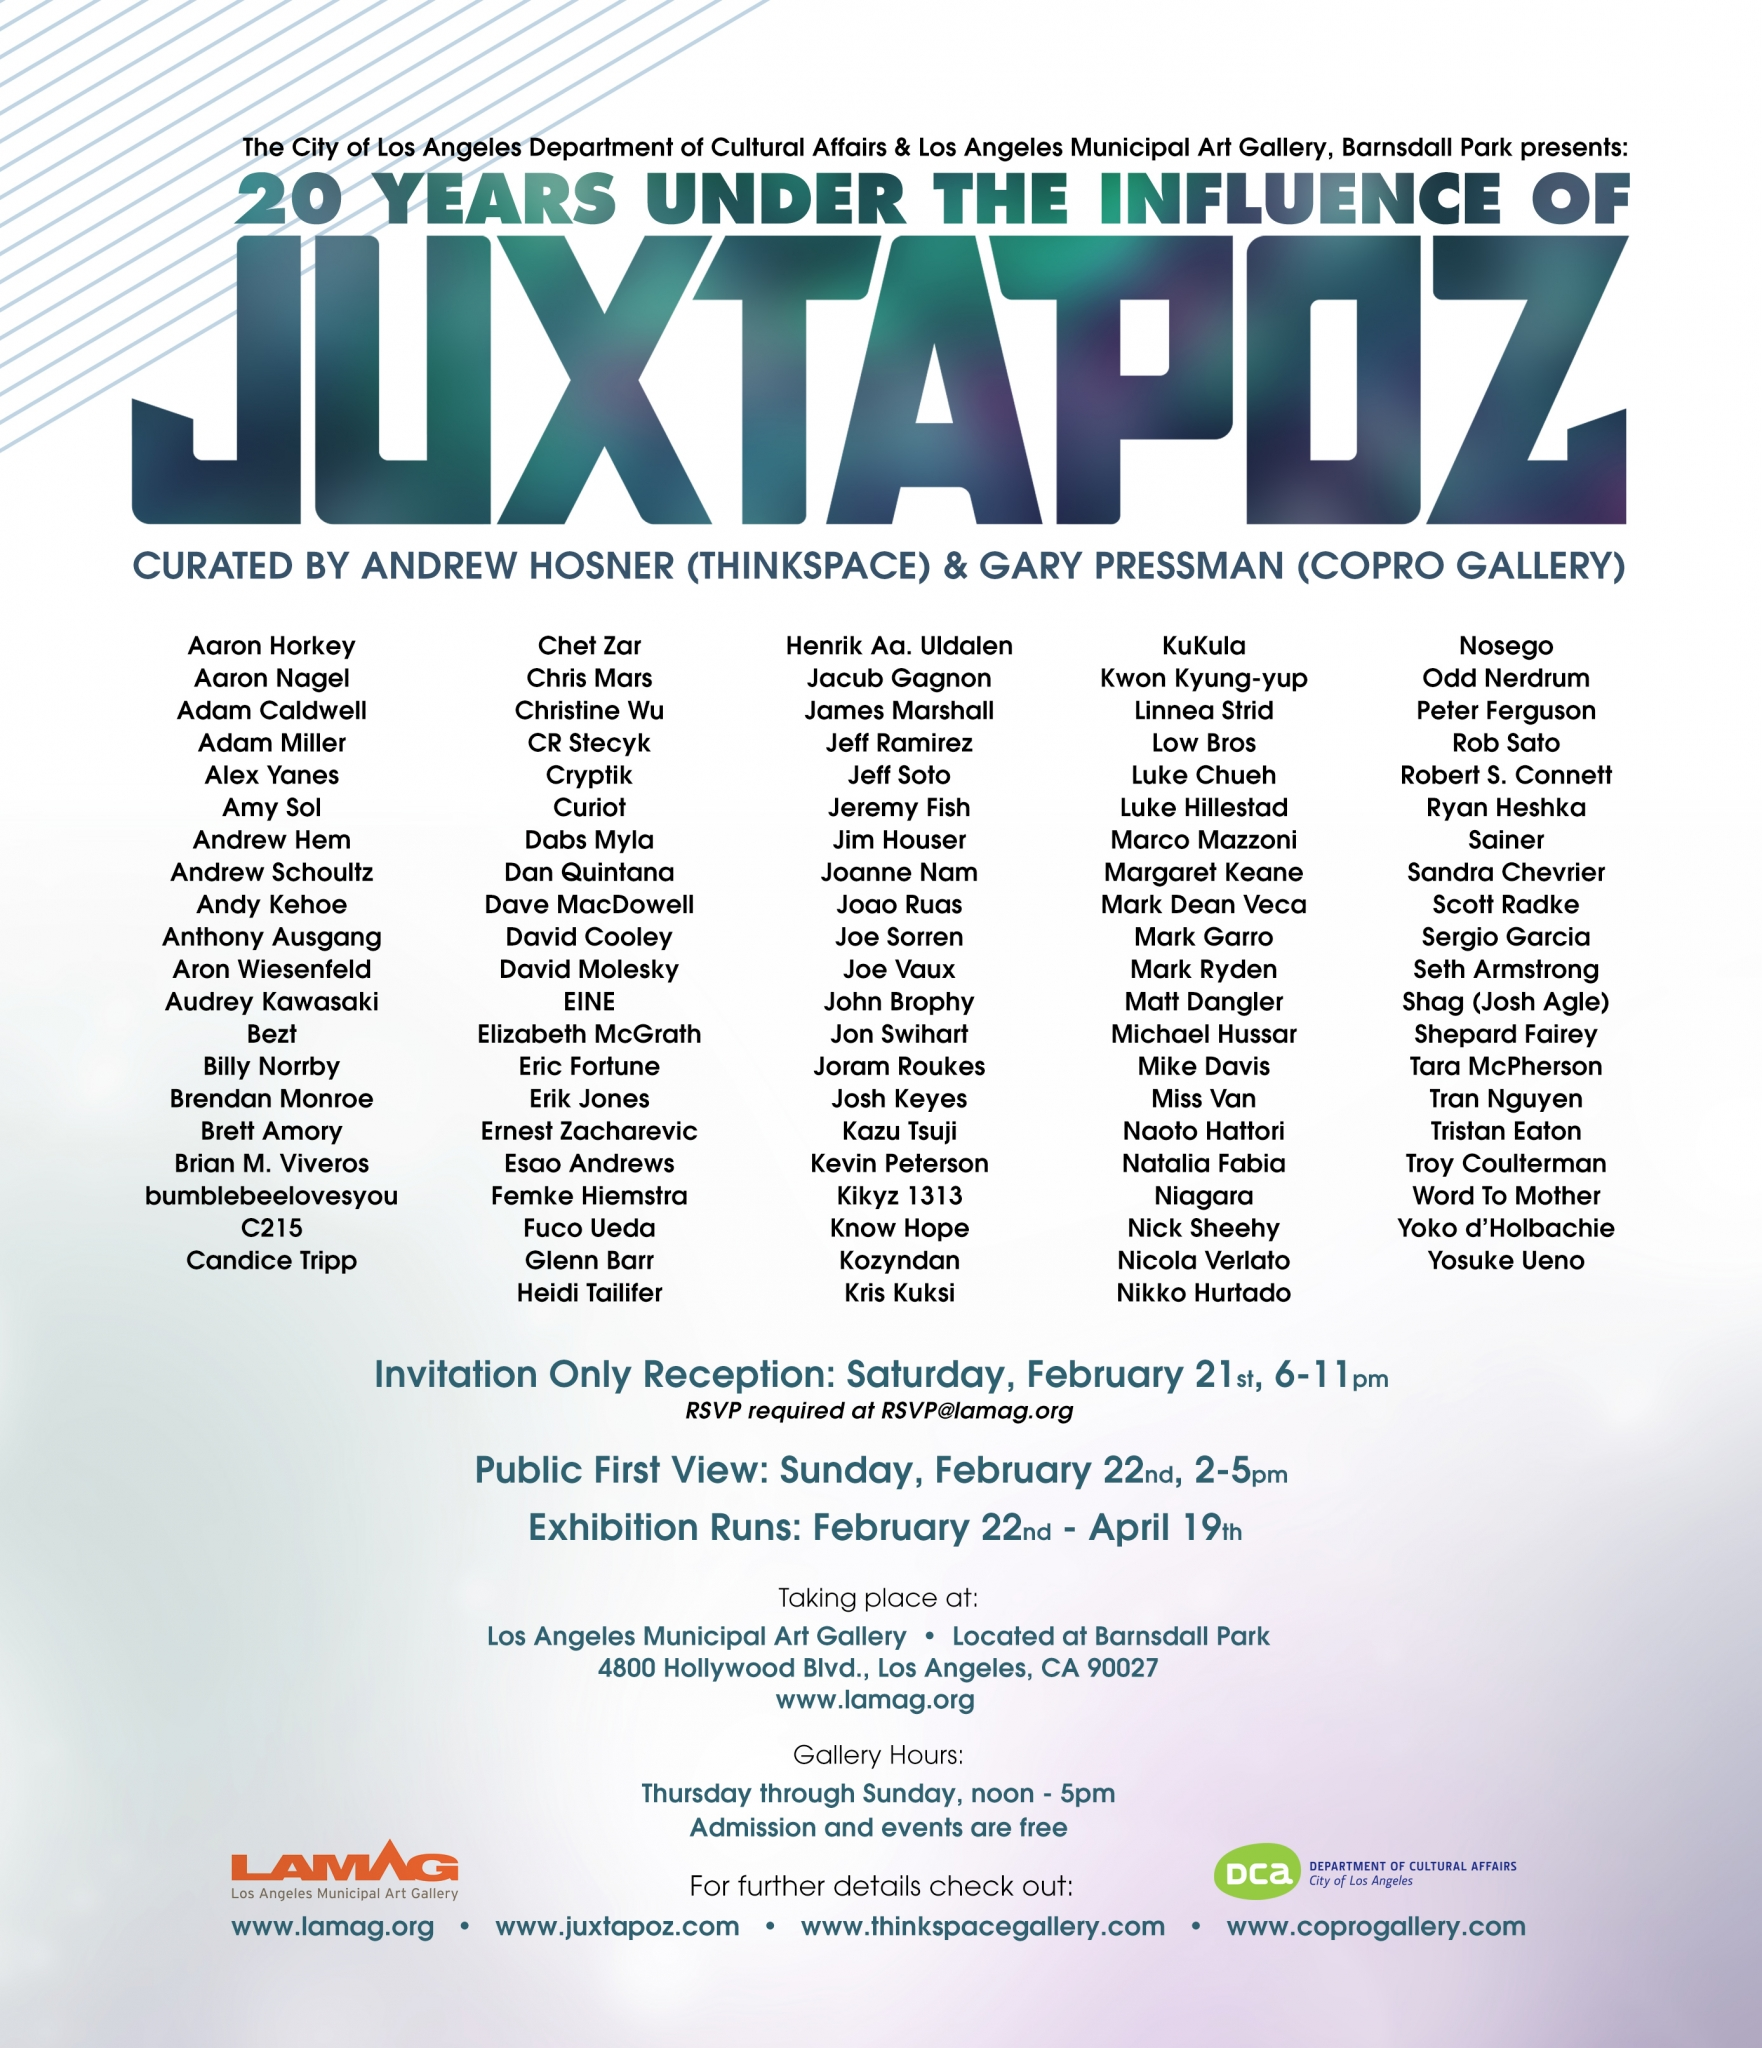 juztapoz ad 20 years under the influence